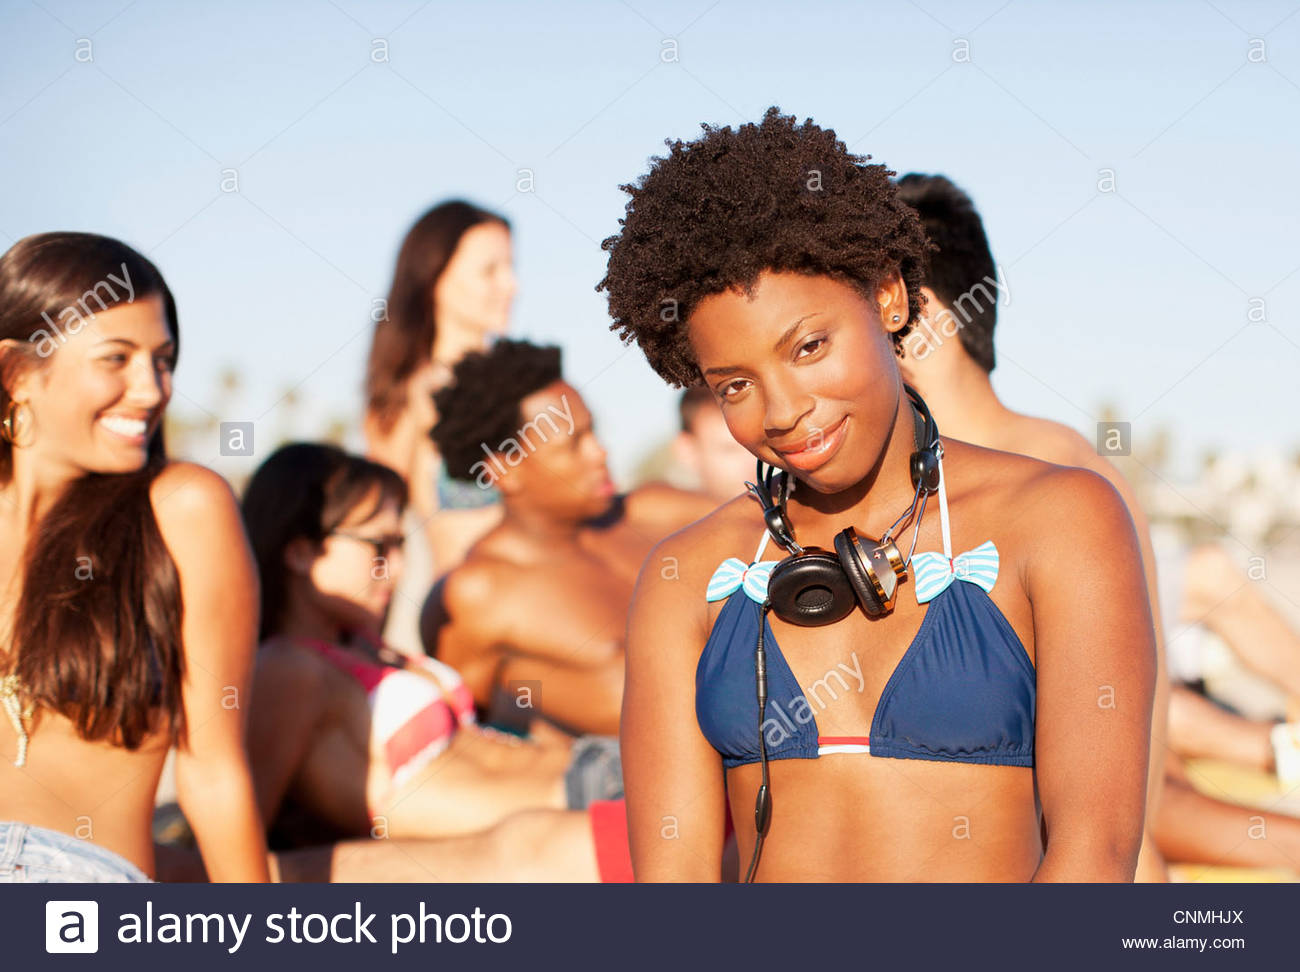 Woman wearing headphones on beach - Stock Image